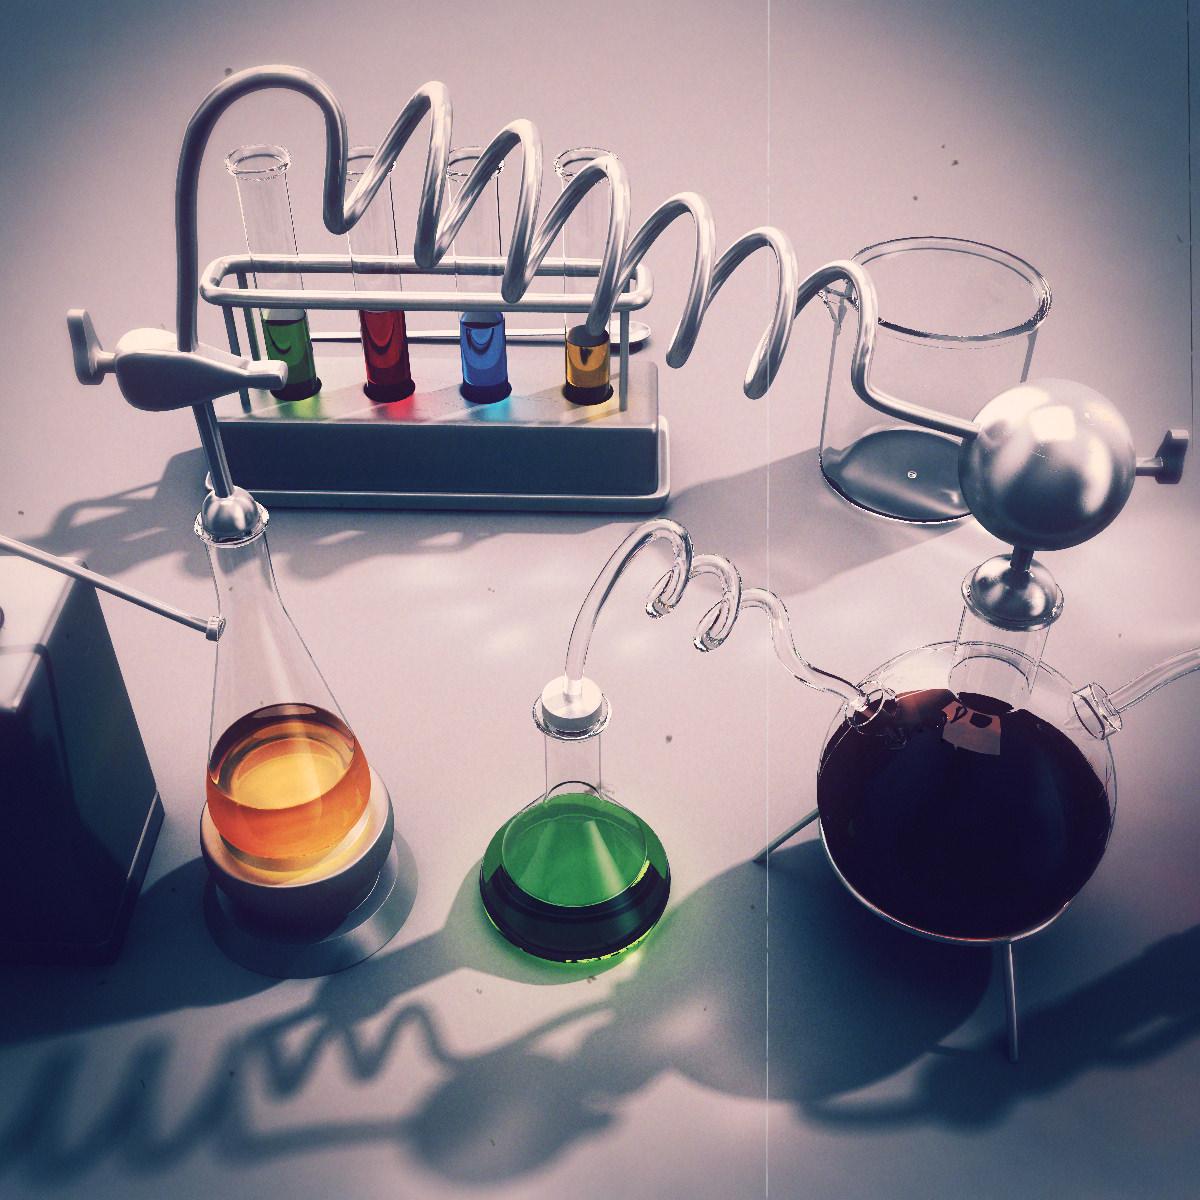 Chemistry Equipment 3d Model Max Obj Fbx Lwo Lw Lws